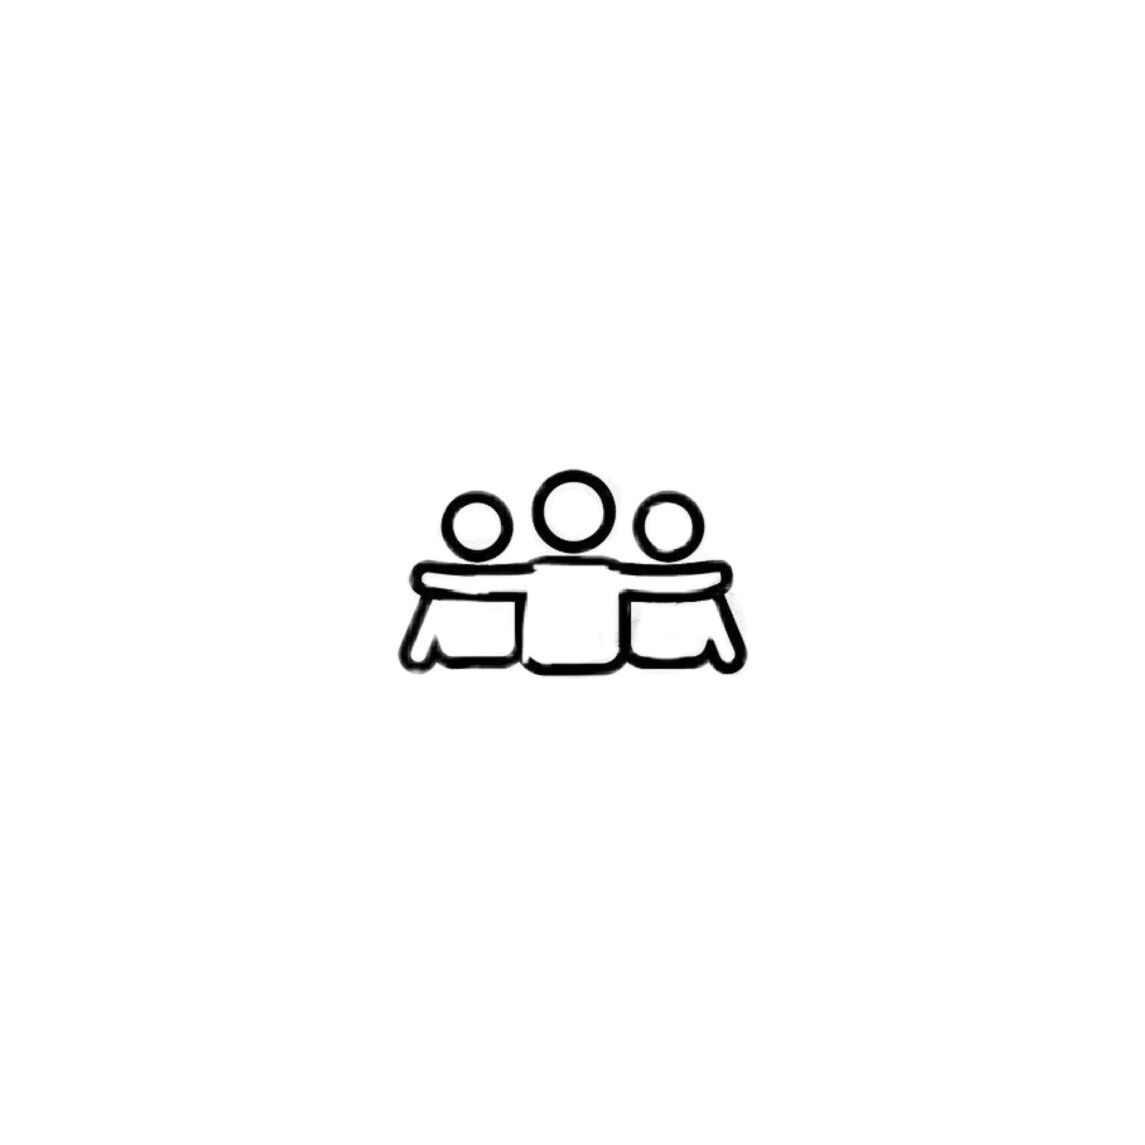 Pin By Sov Alice On Wallpaper Instagram Logo Instagram White Instagram Icons